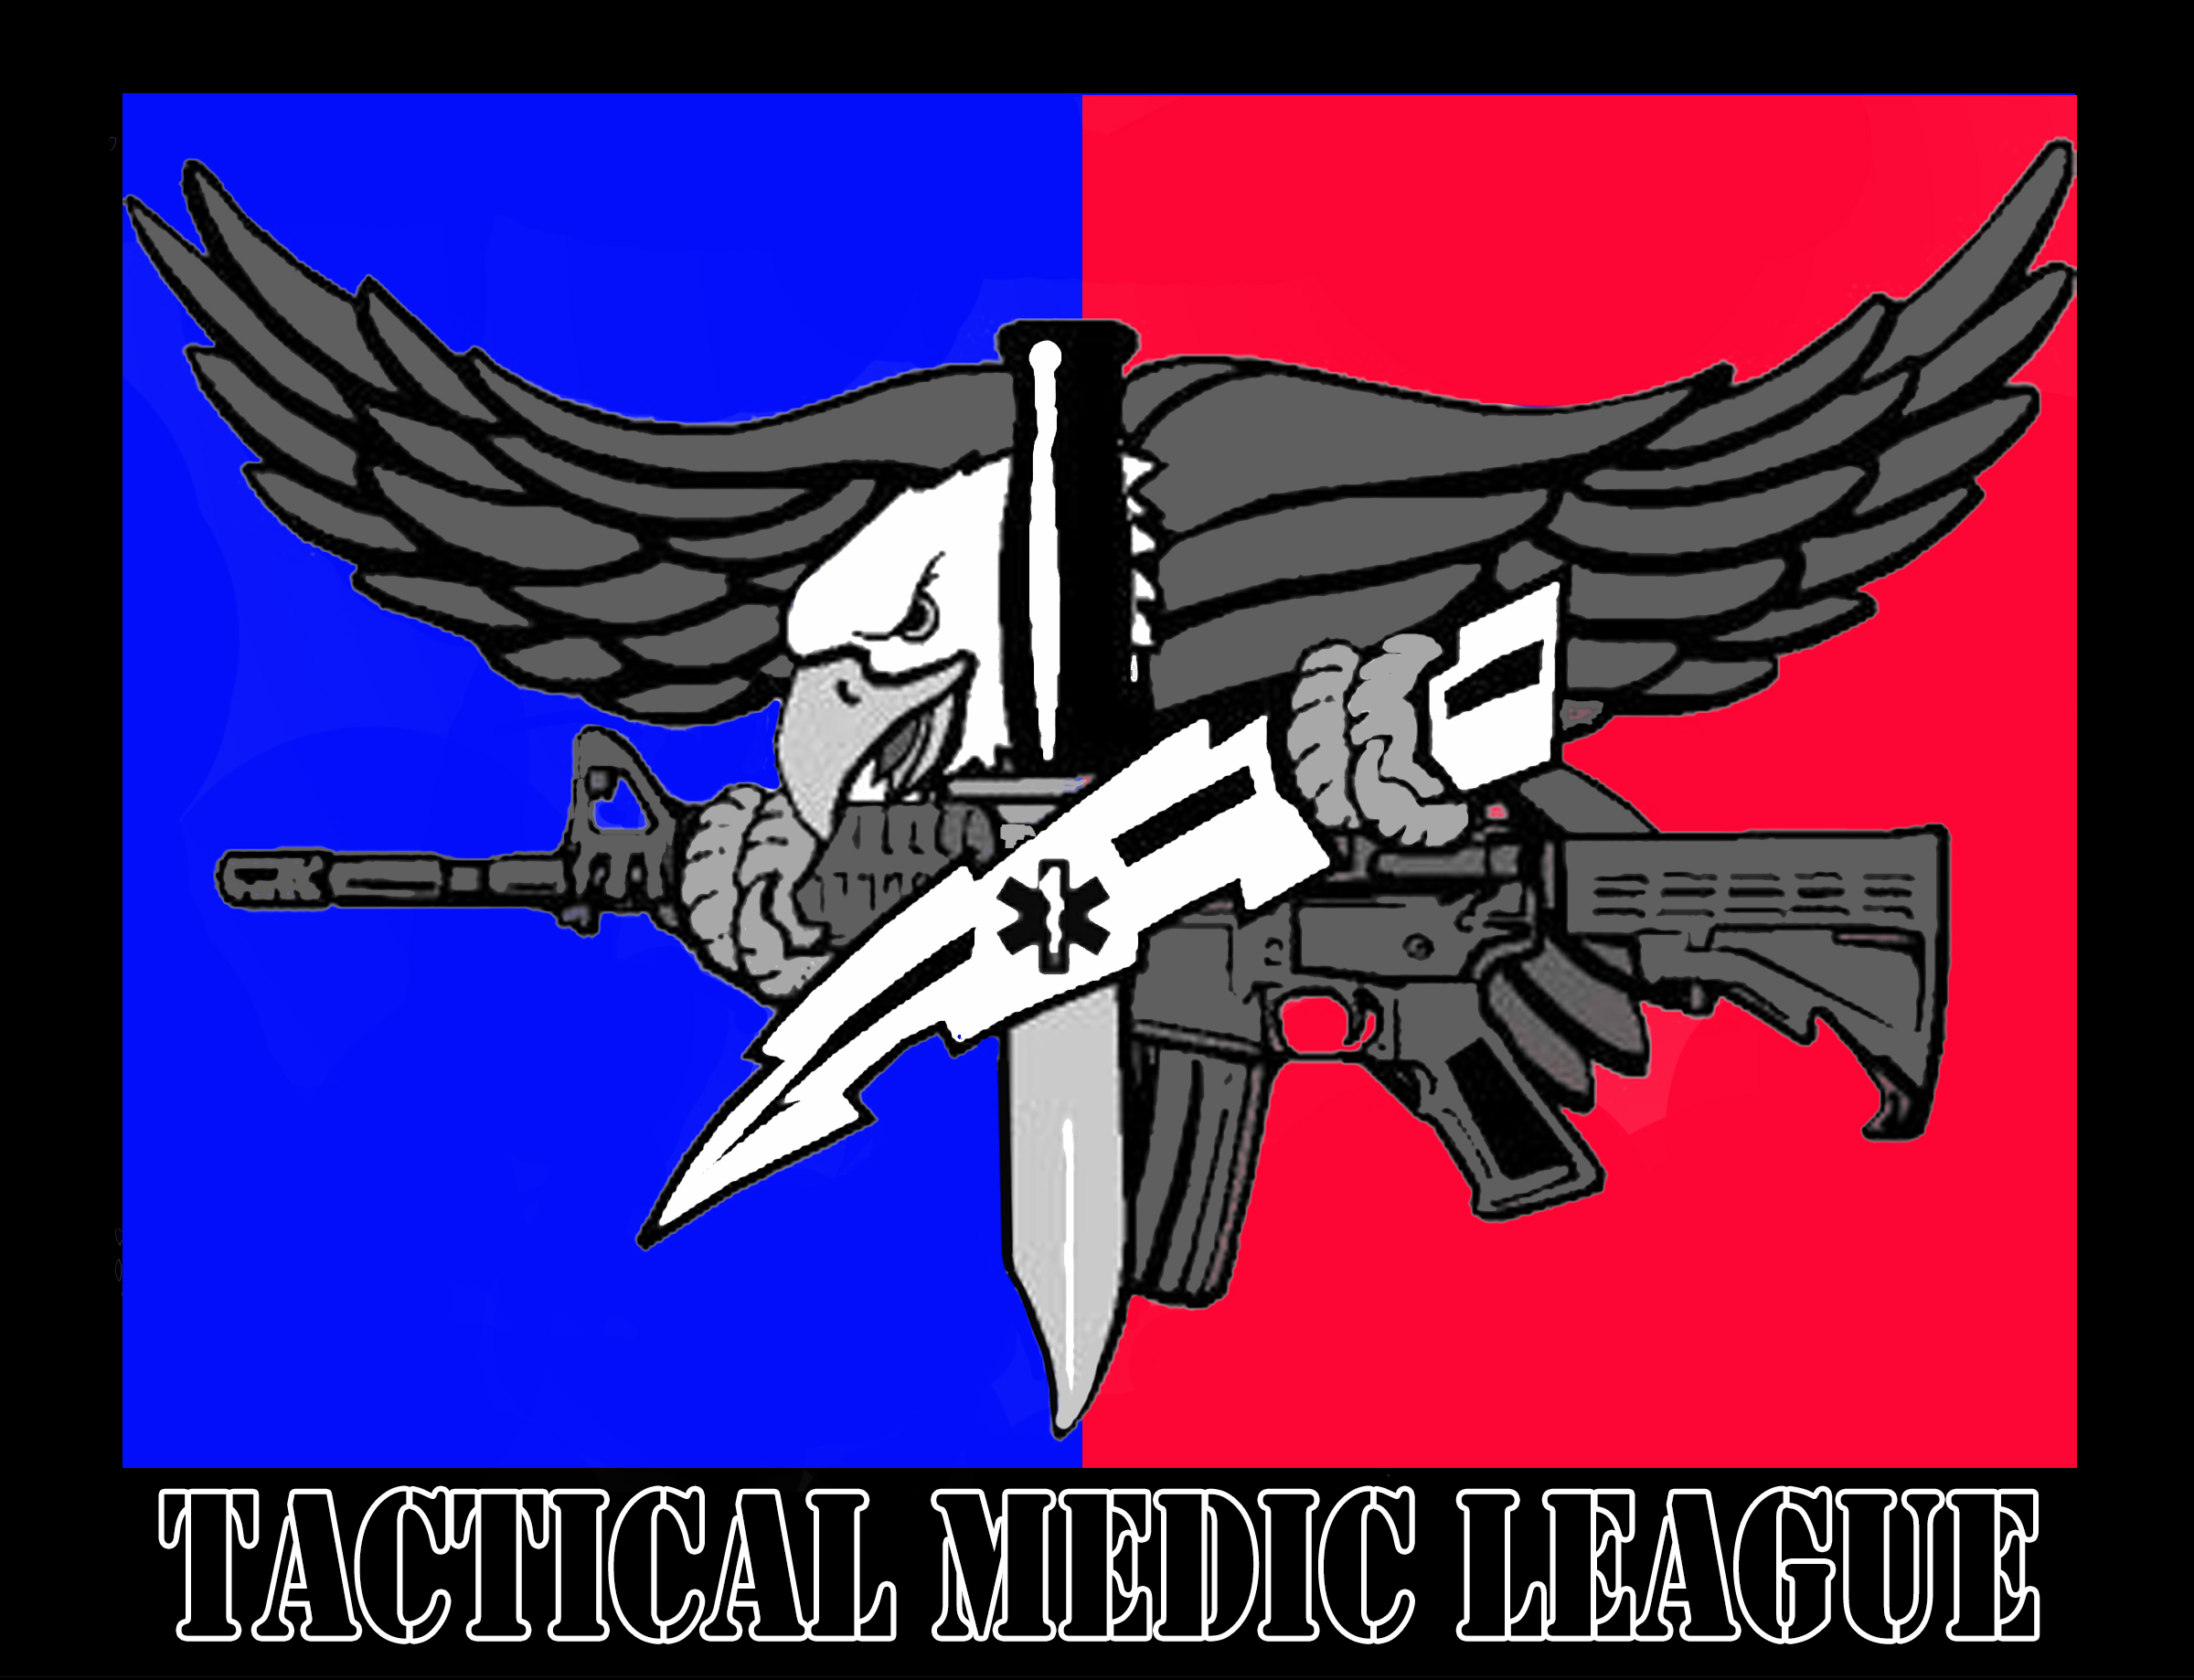 TacticalMedicLeague (1)